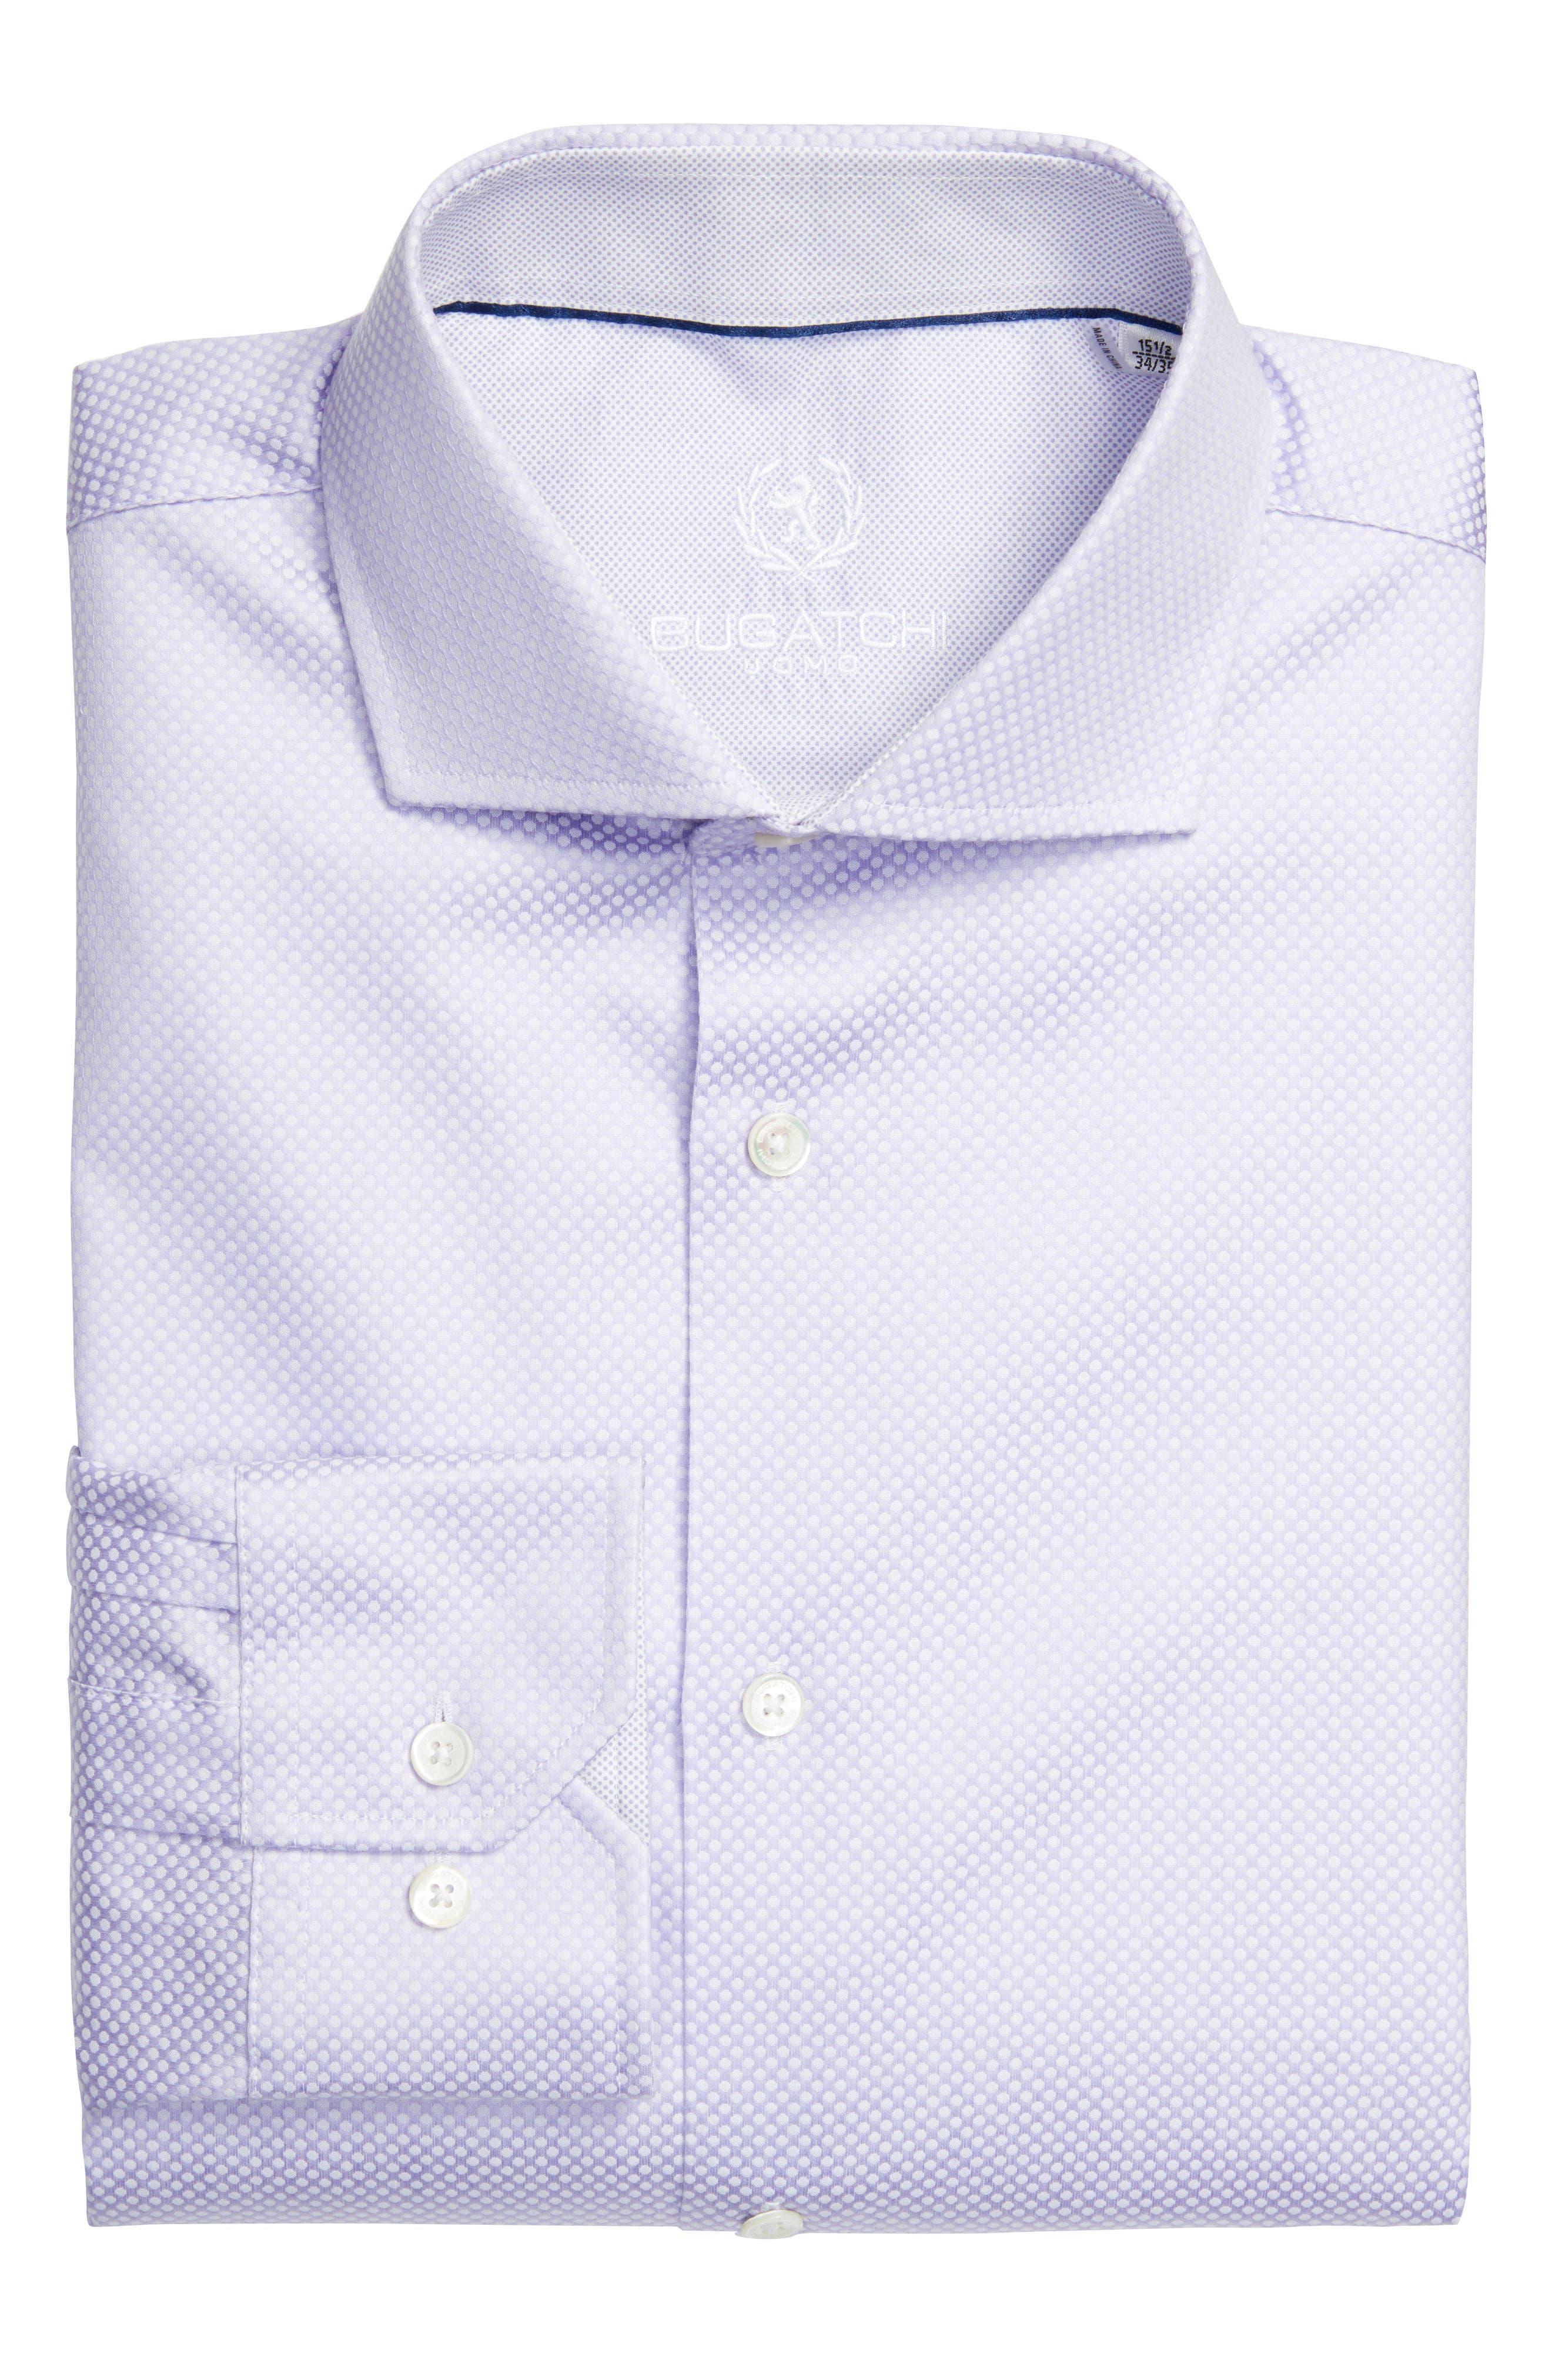 Trim Fit Dot Jacquard Dress Shirt,                         Main,                         color, Lavender